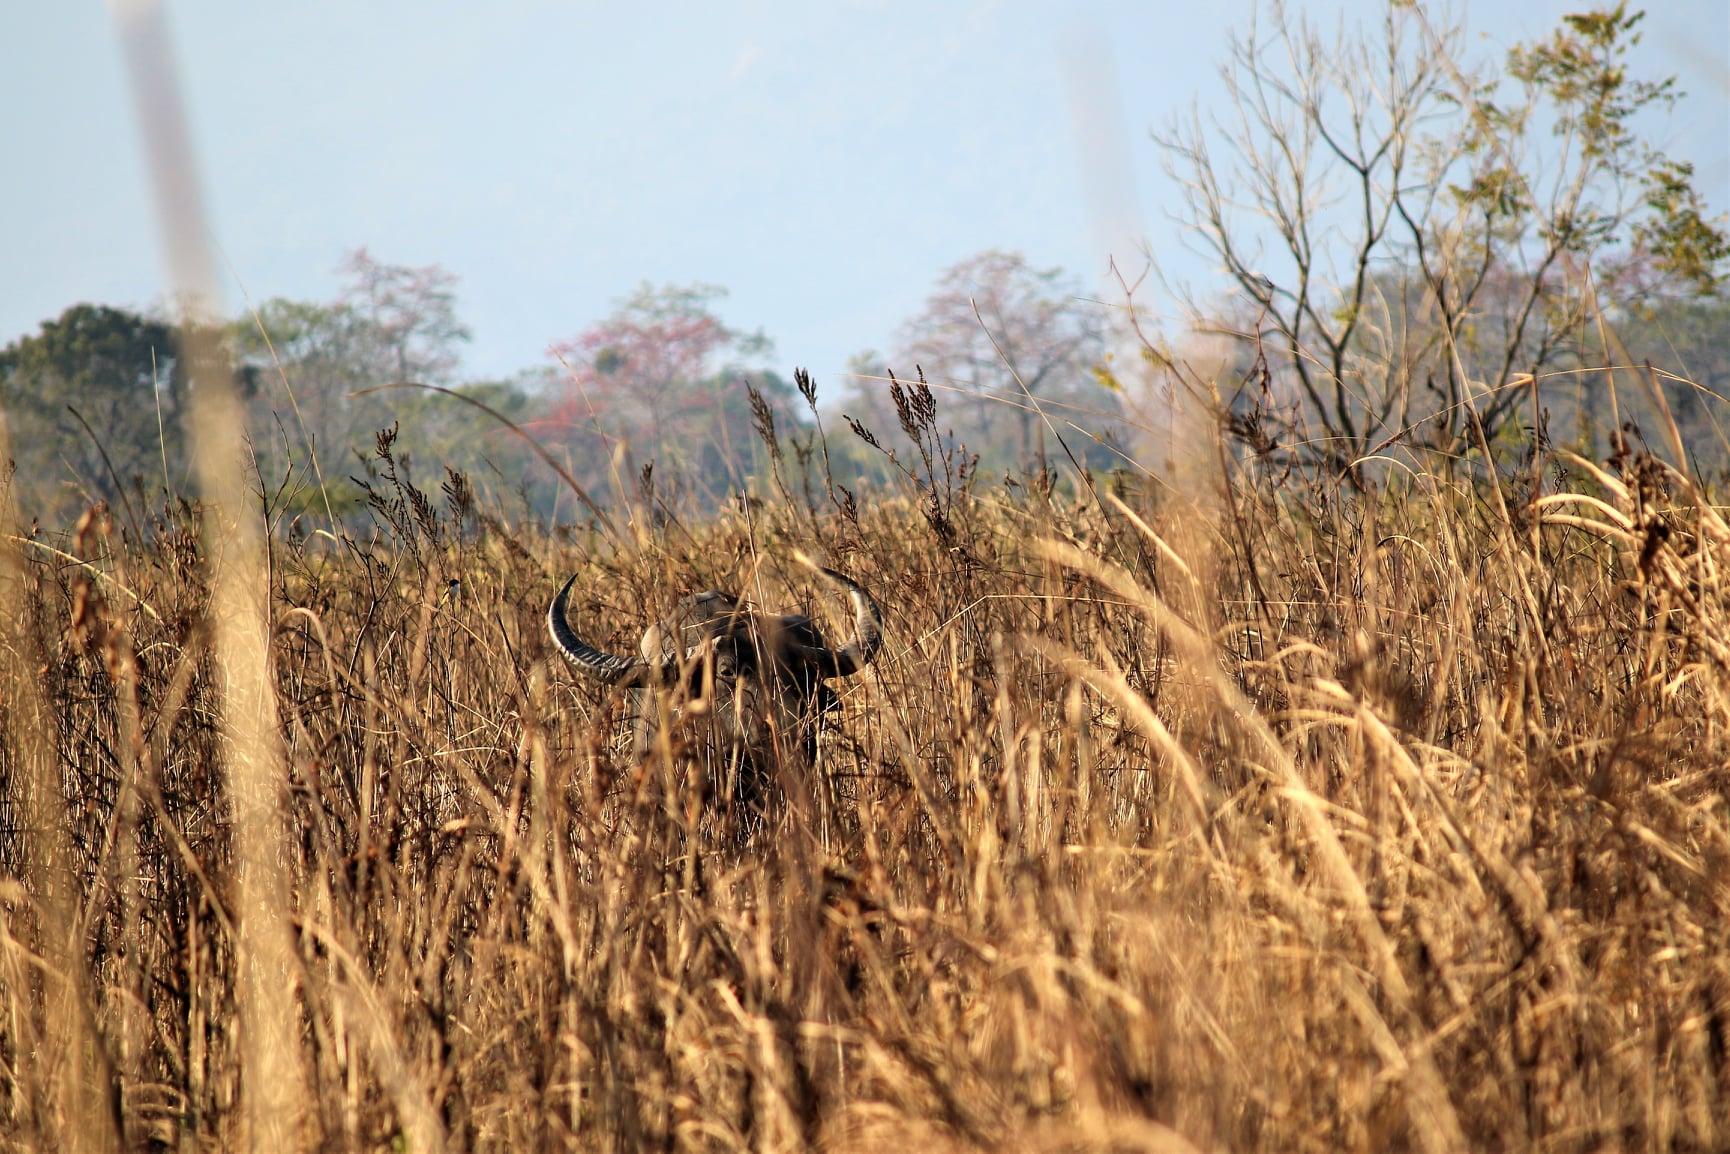 Revival of Manas National Park